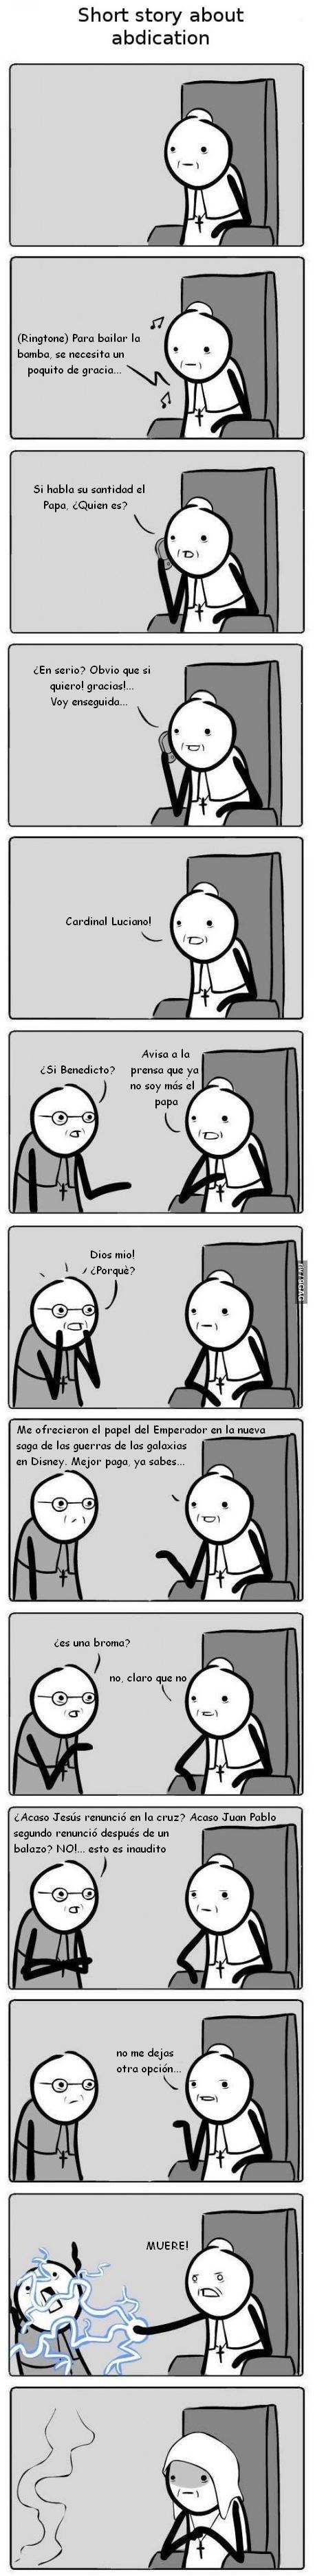 historia papal